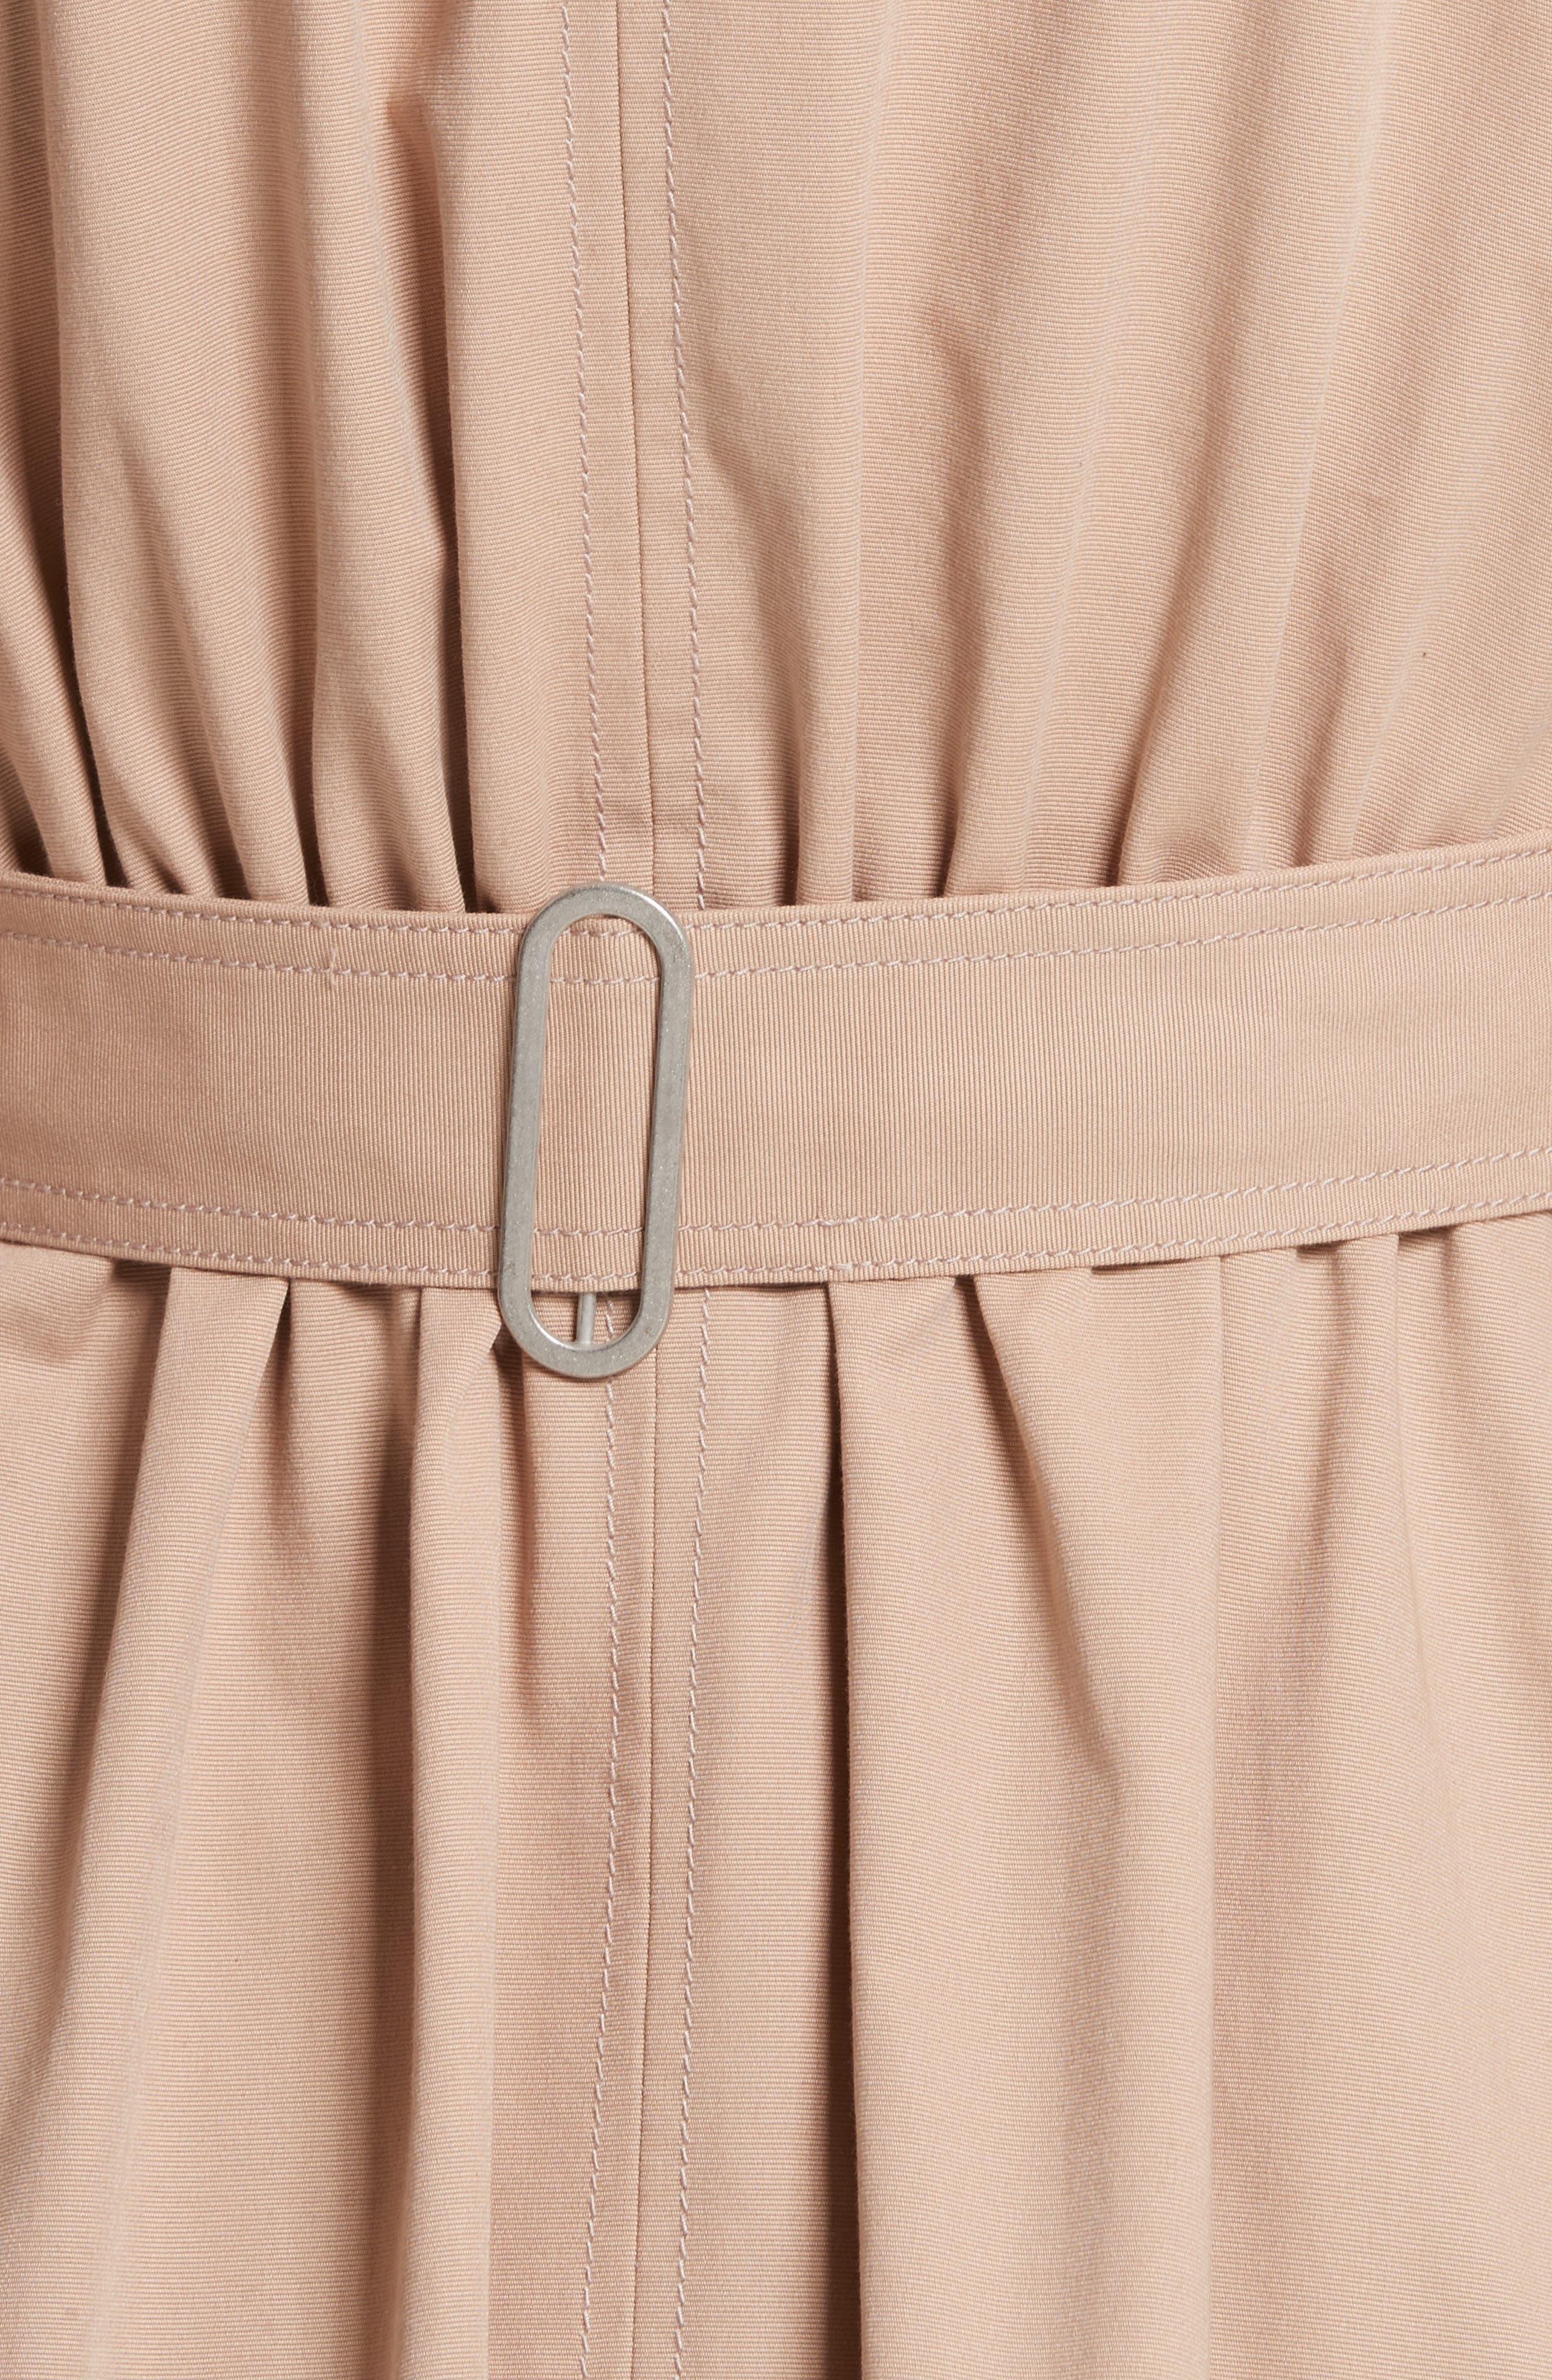 Ruffle Trim Trench Coat,                             Alternate thumbnail 6, color,                             285